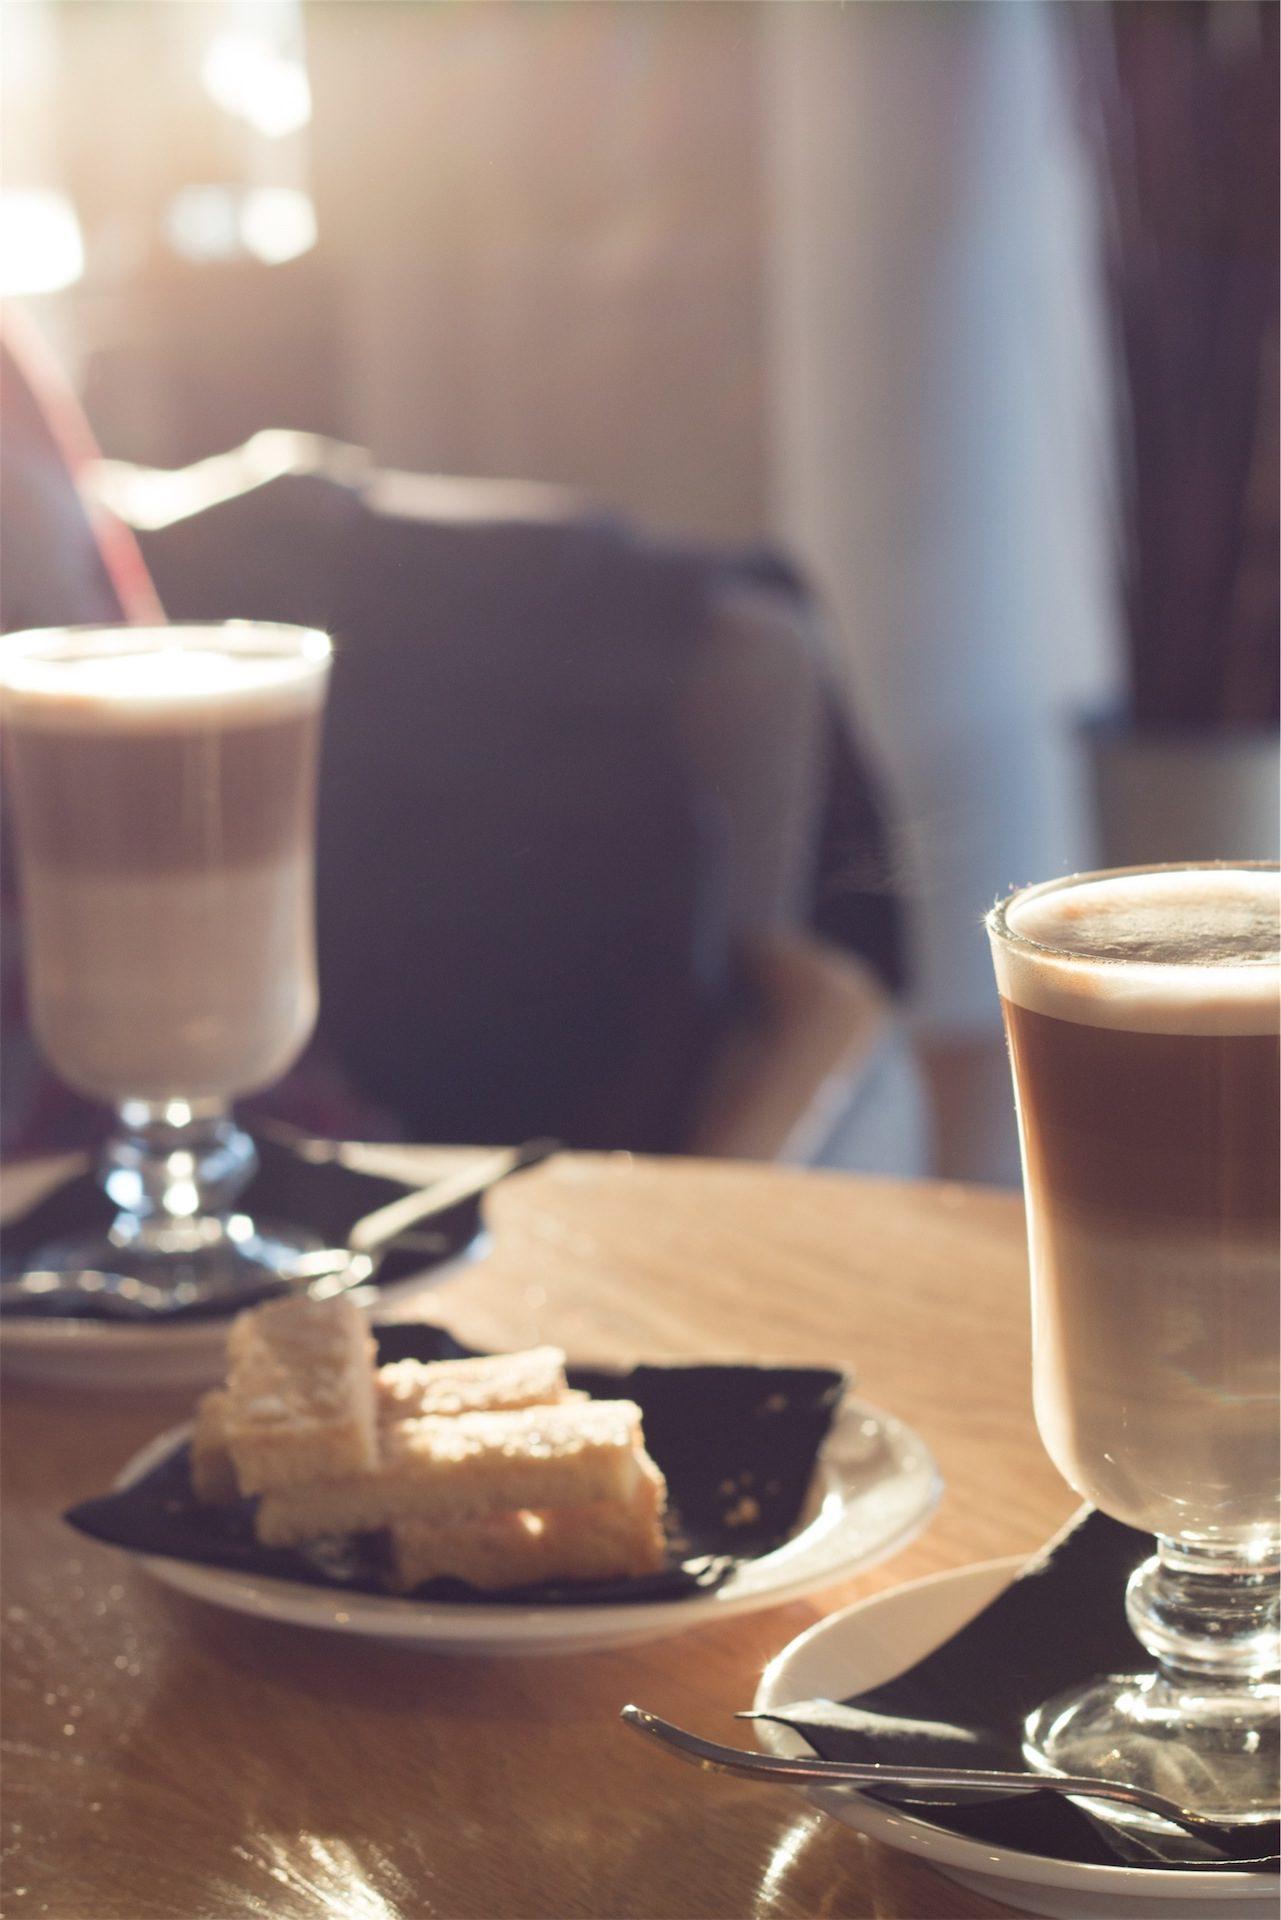 cafés, le petit déjeuner, collations, lait, tasses, plat - Fonds d'écran HD - Professor-falken.com